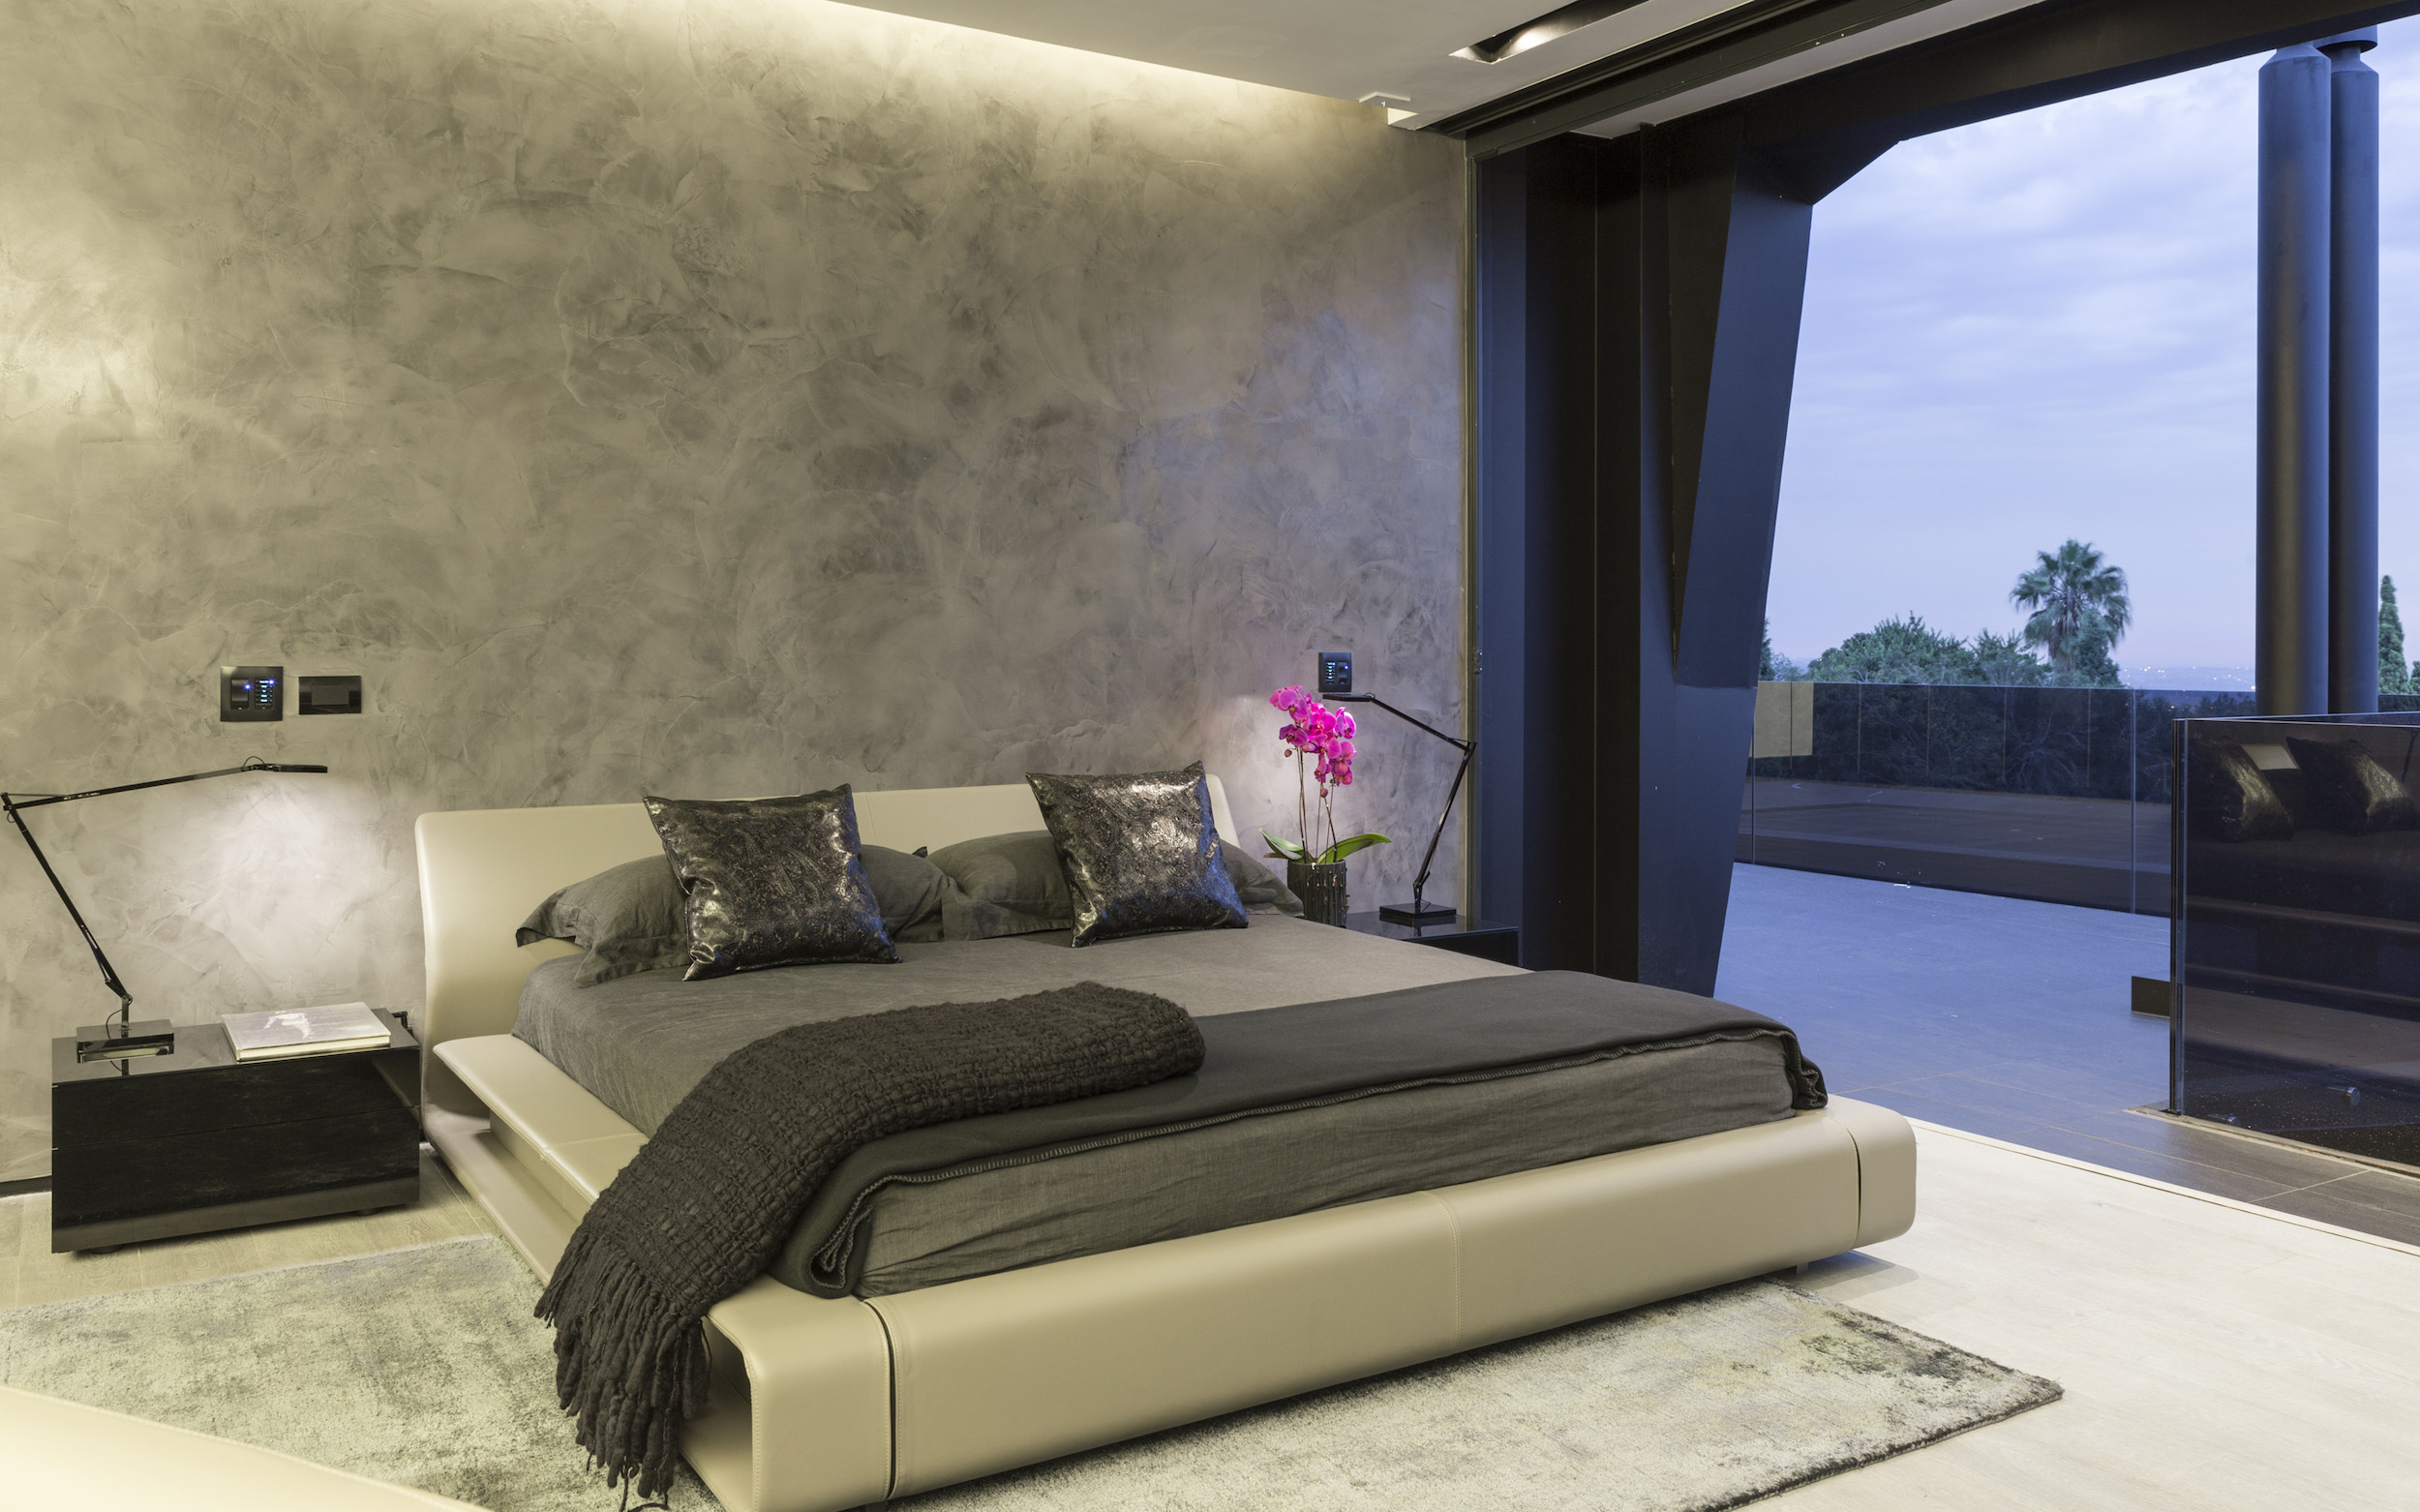 Kloof Road Masterpiece House in Johannesburg by Nico van der Meulen Architects-39